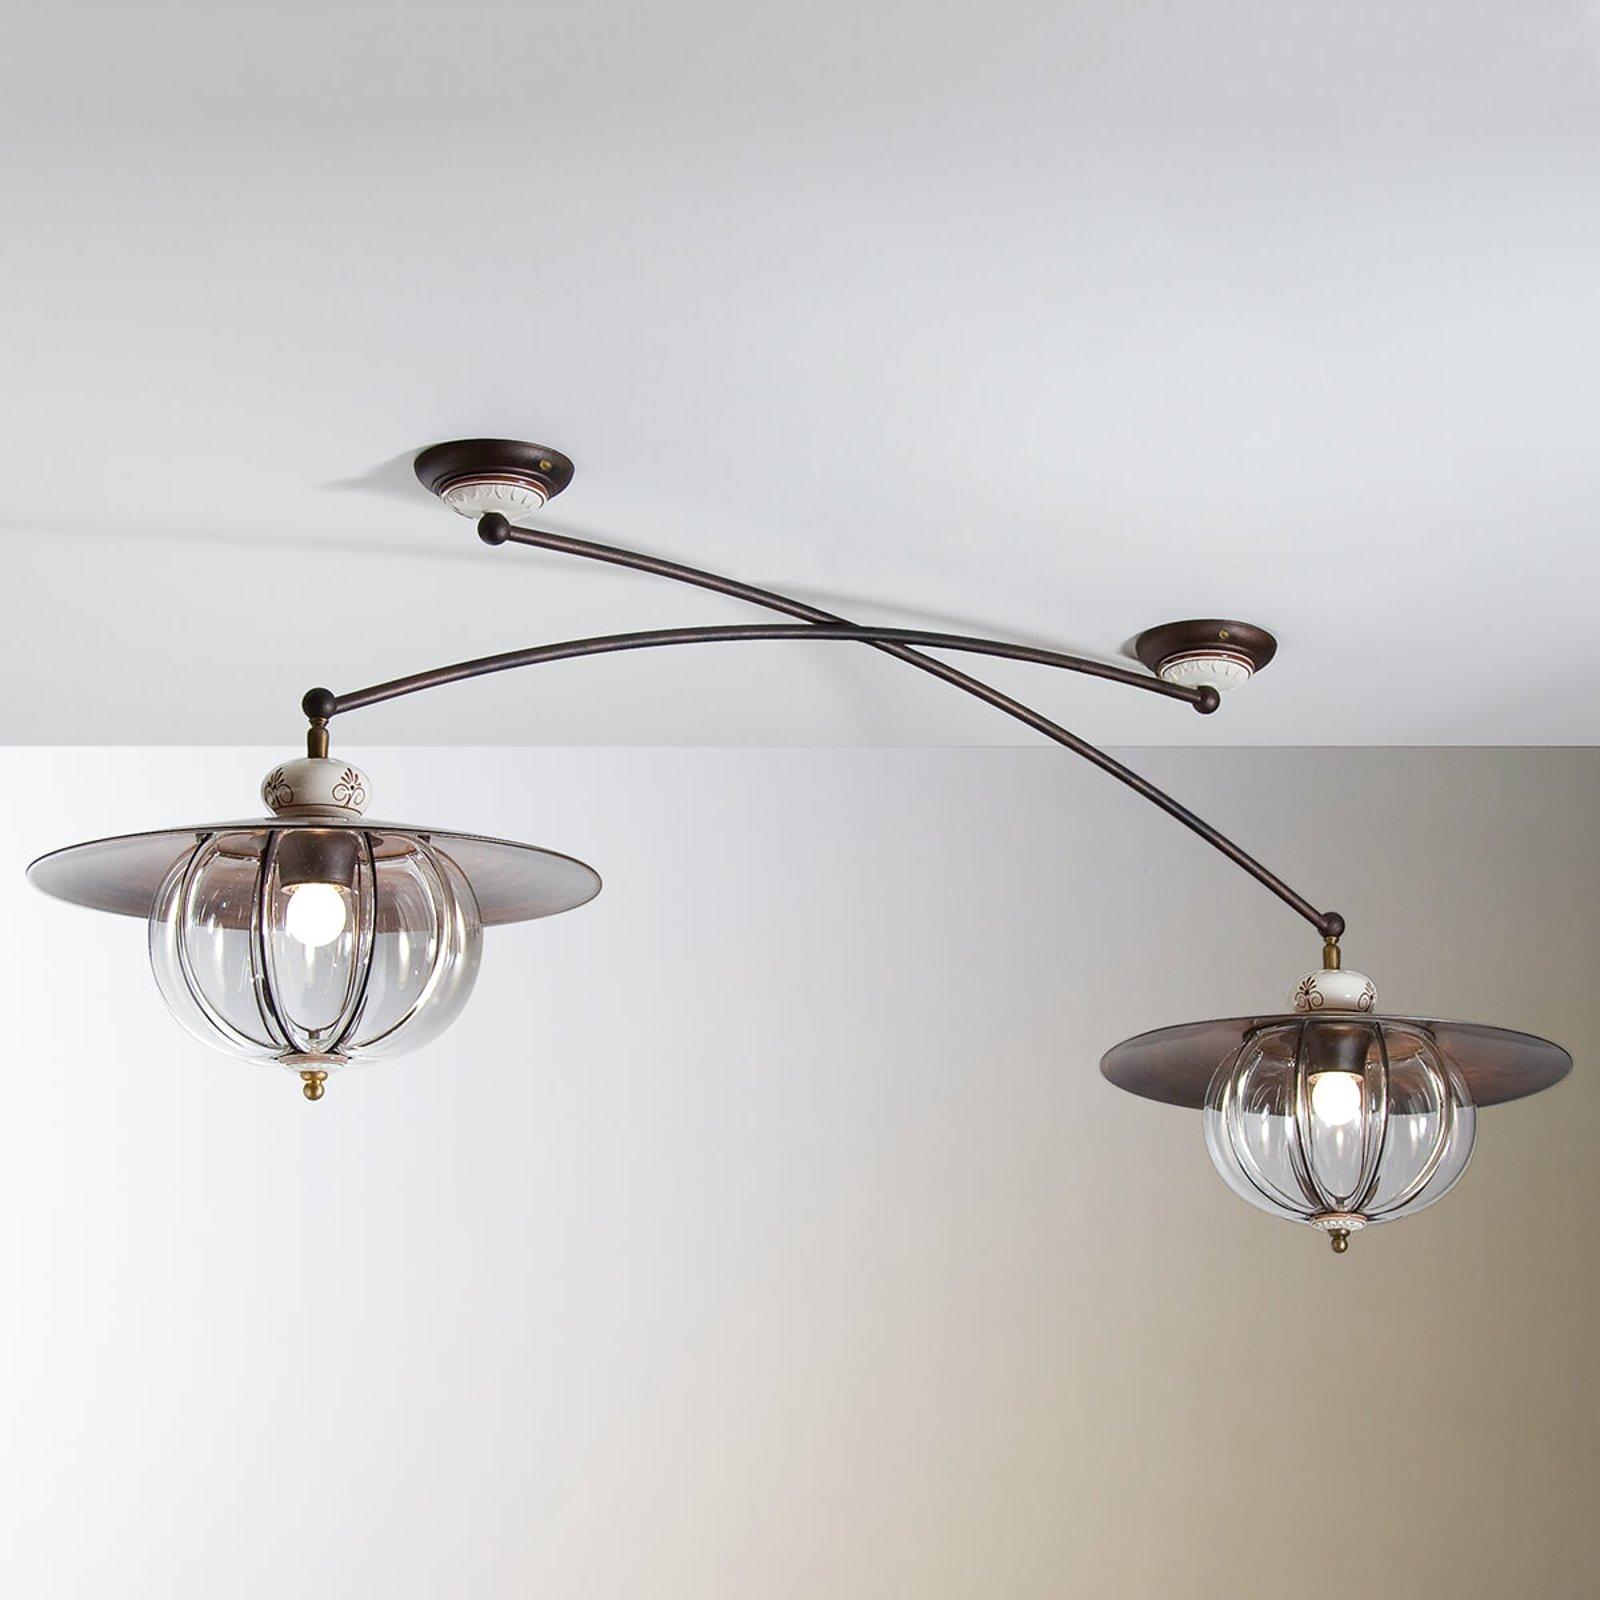 Taklampe 2 lyskilder Lampara i hyttestil